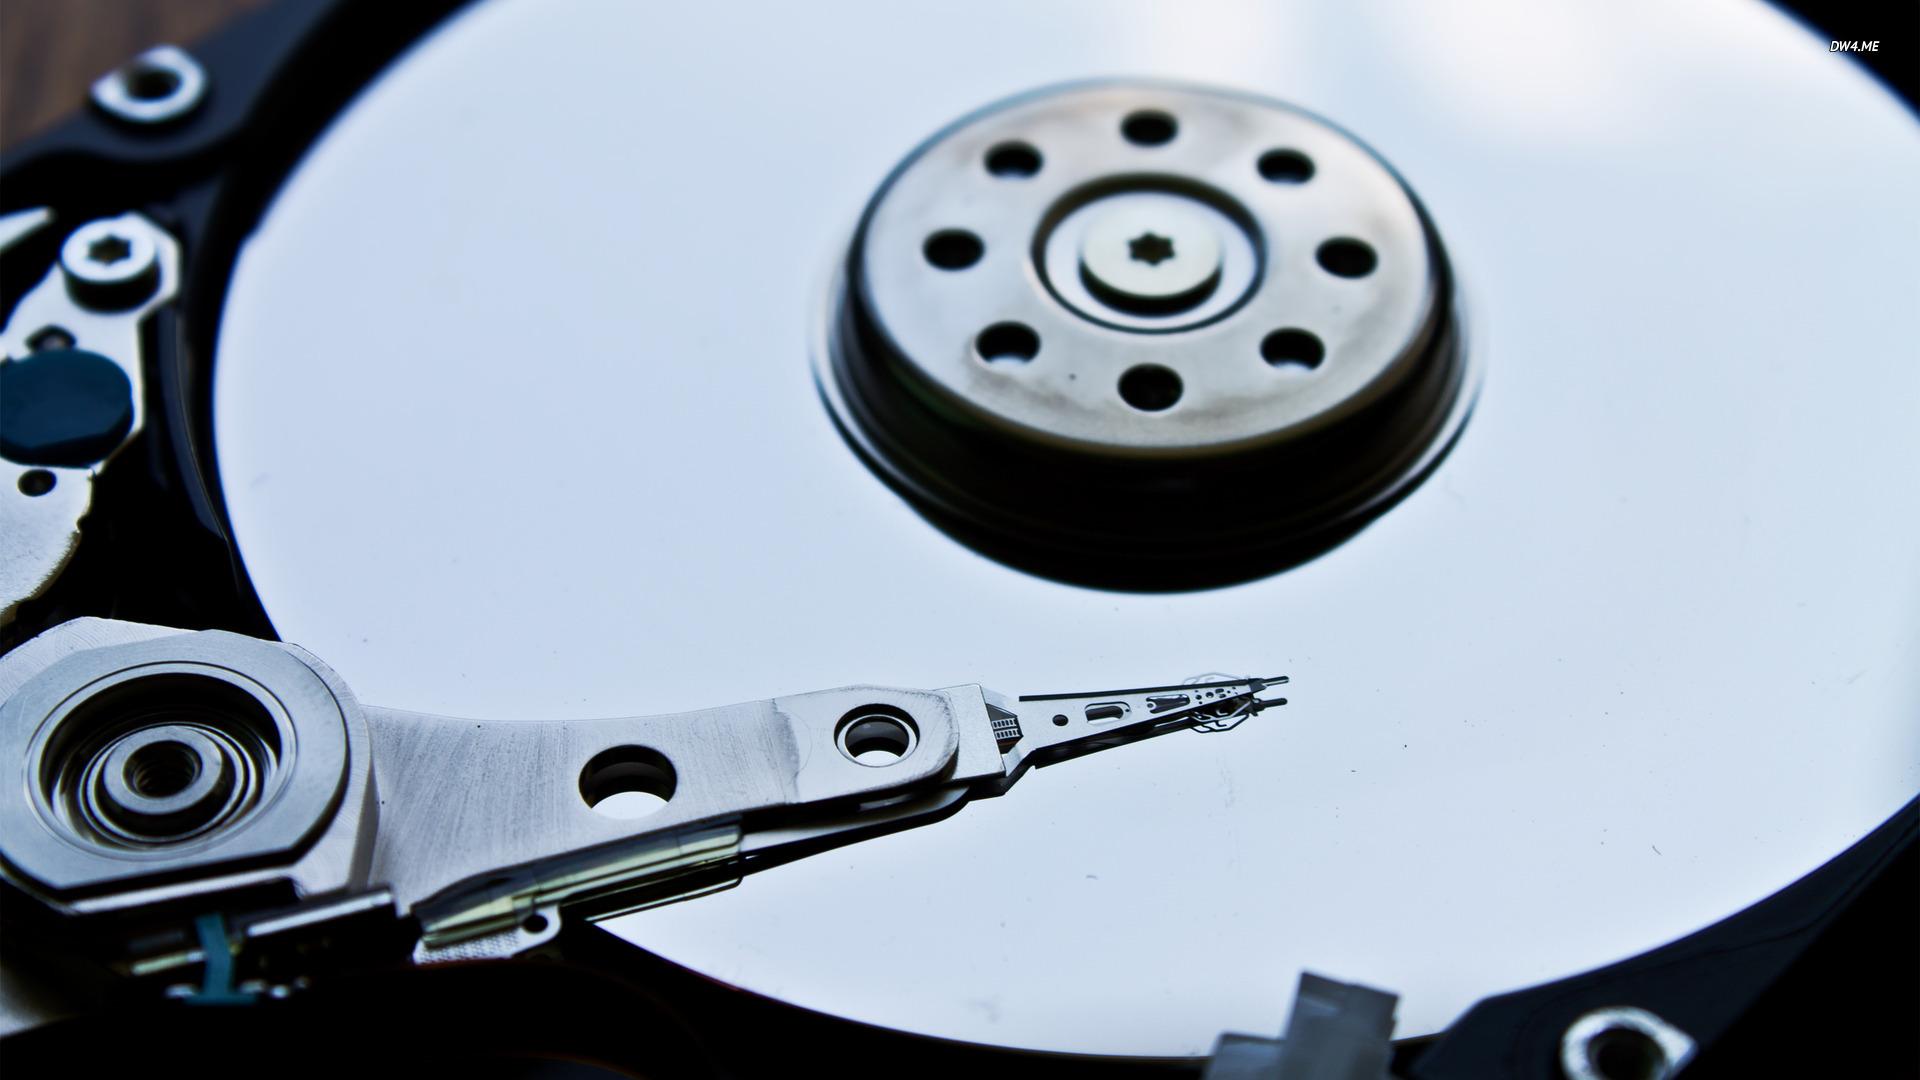 Hard Disk Drive wallpapers HD   343124 1920x1080